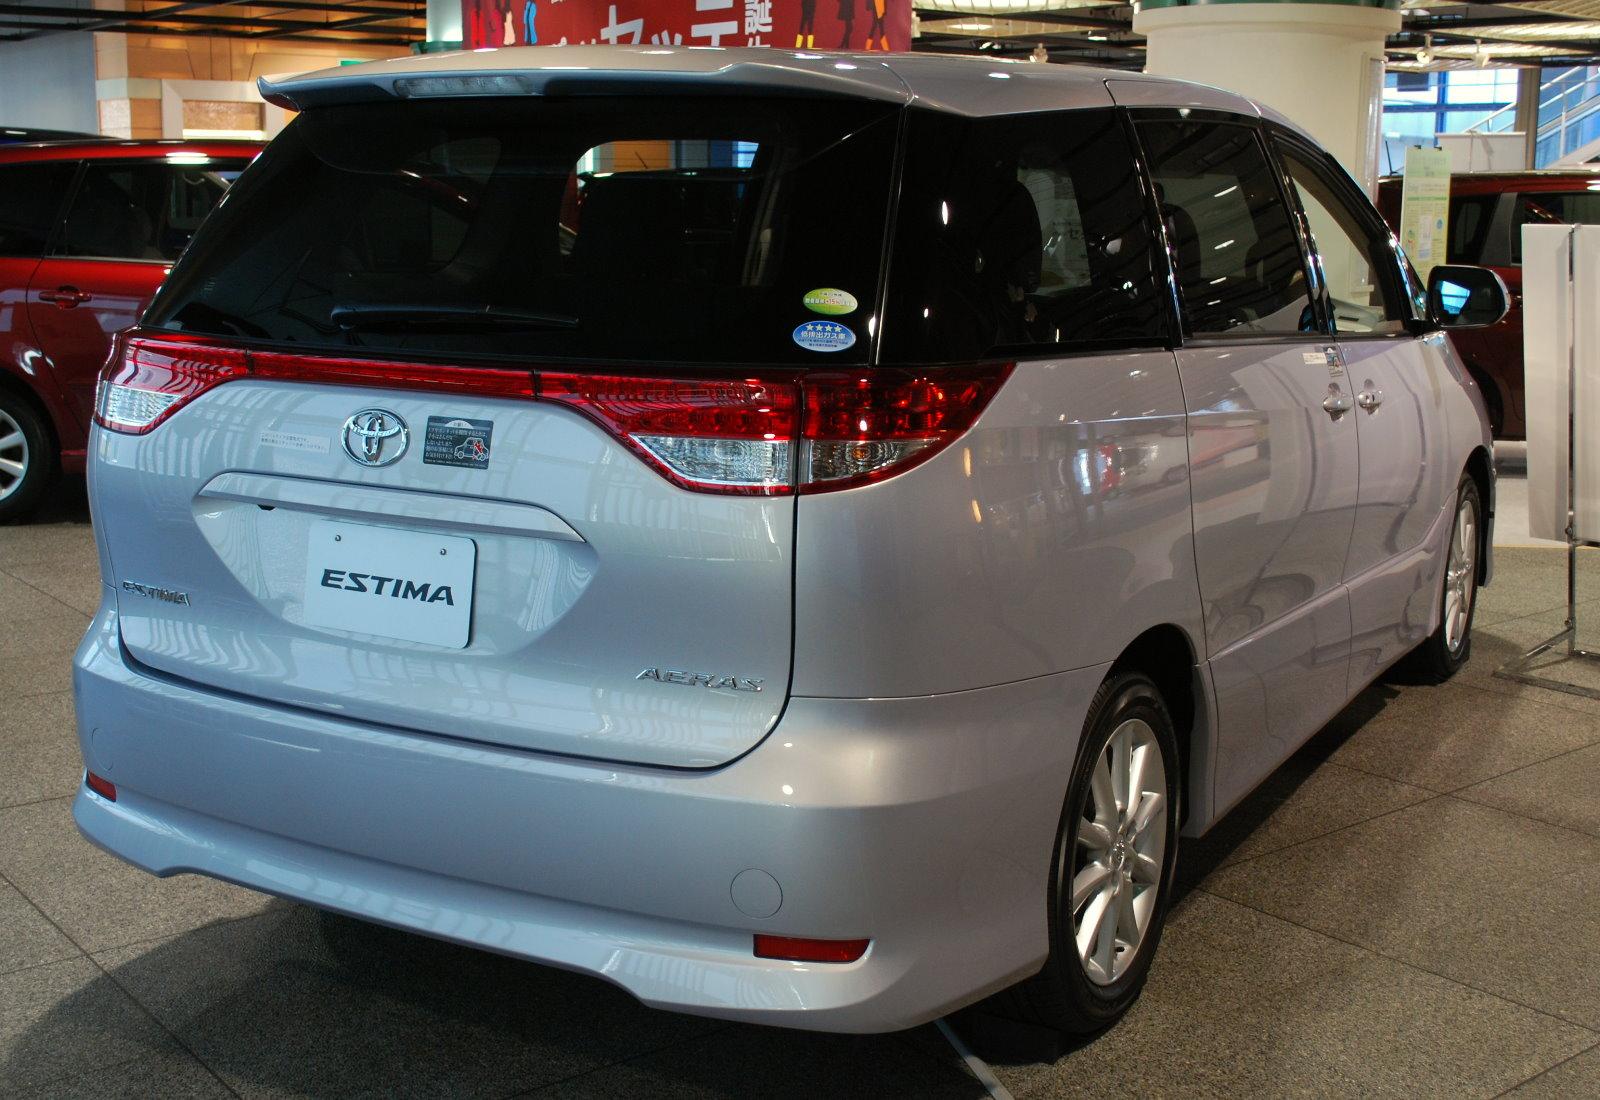 File:2008 Toyota Estima 02.jpg - Wikimedia Commons